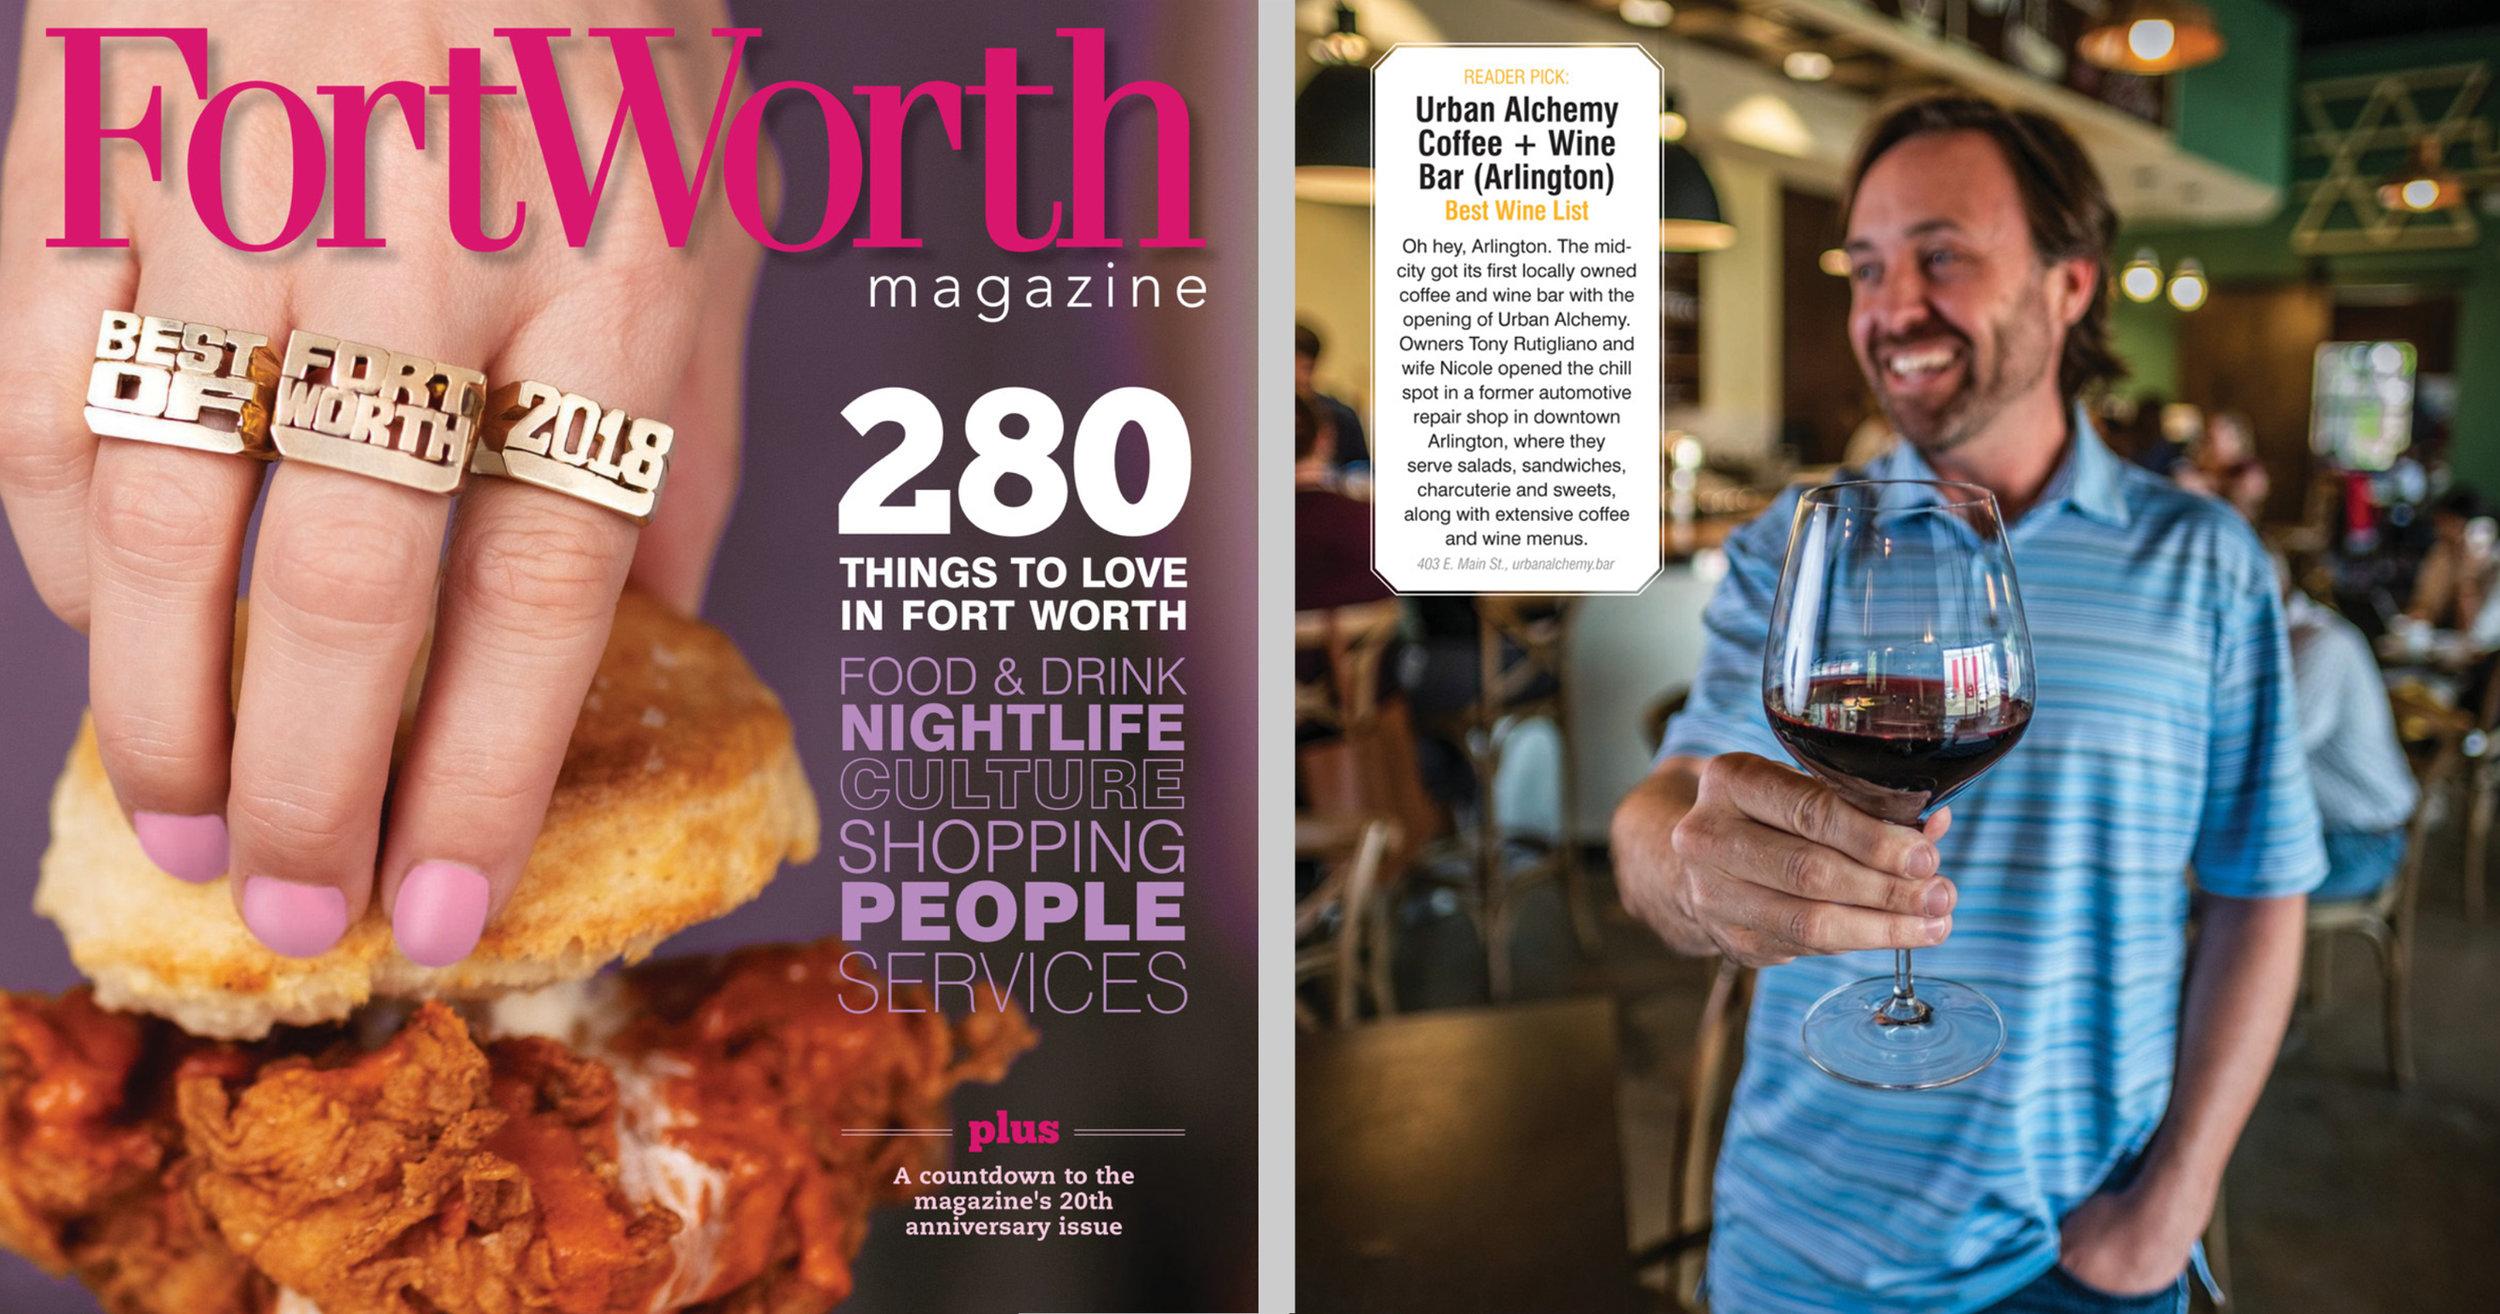 Fort Worth Magazine, June 2018